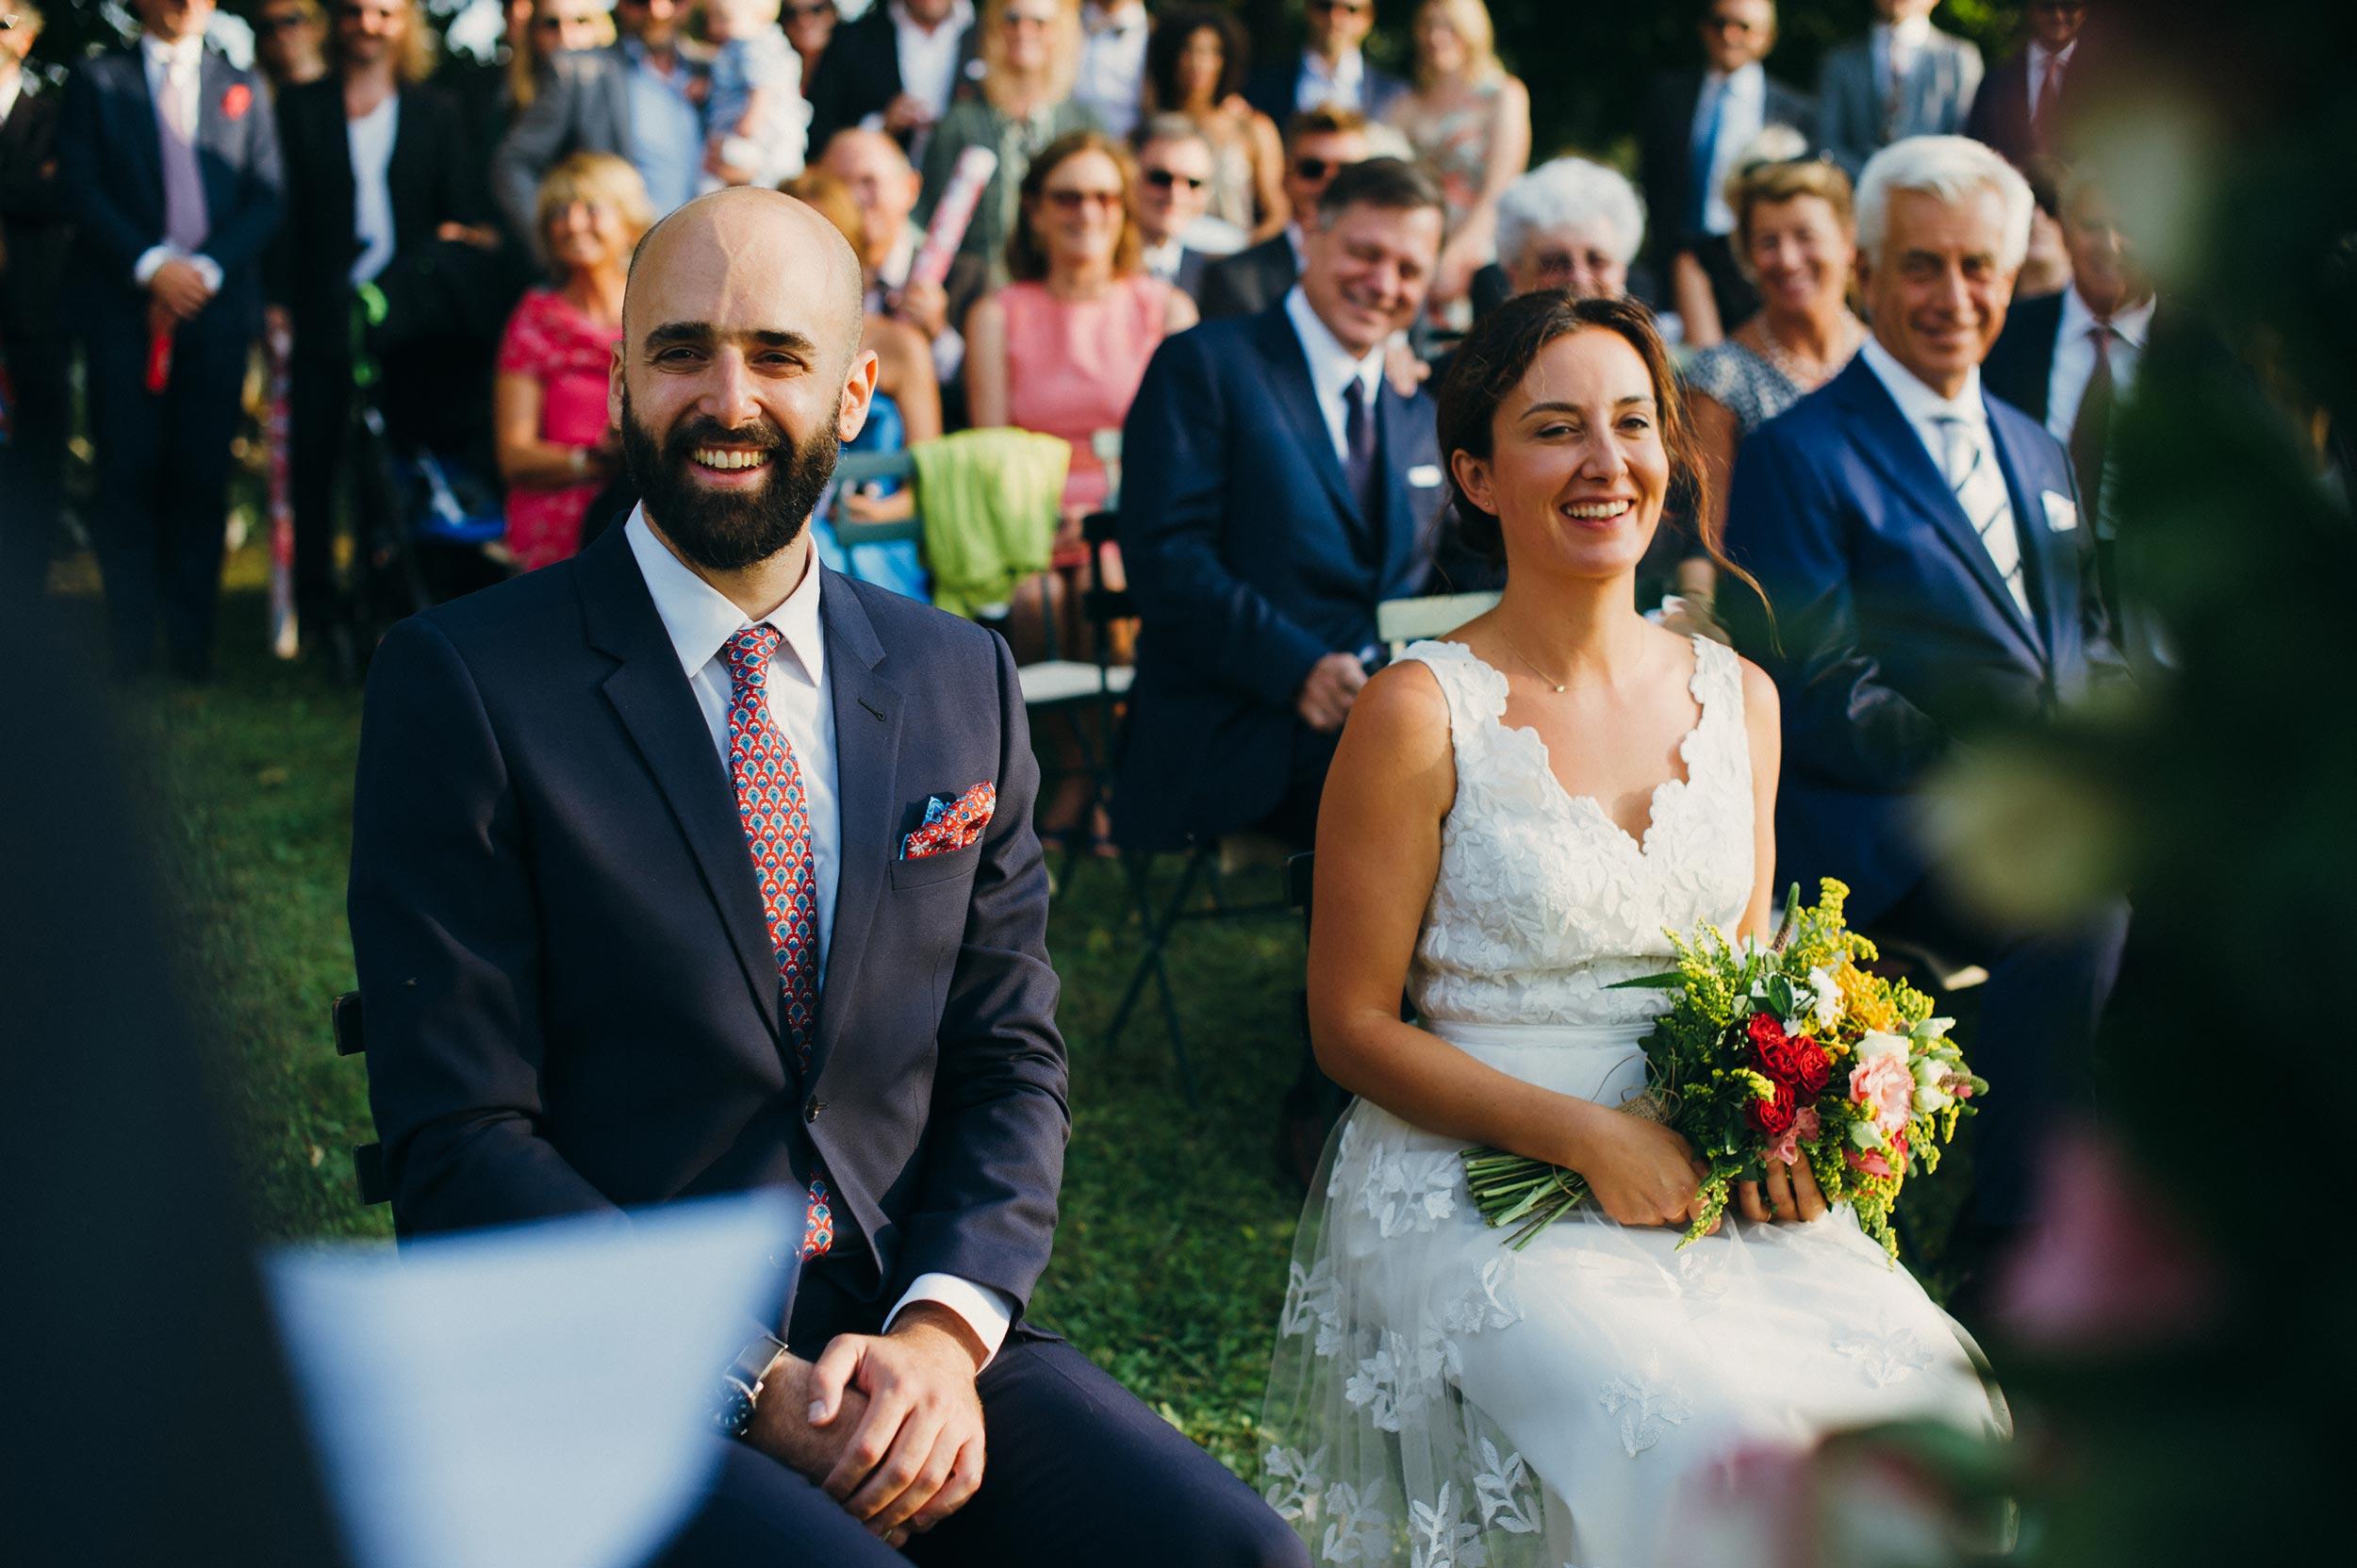 2016-Davor-Chiara-Monferrato-Asti-Vercelli-Wedding-Photographer-Italy-Alessandro-Avenali-30.jpg